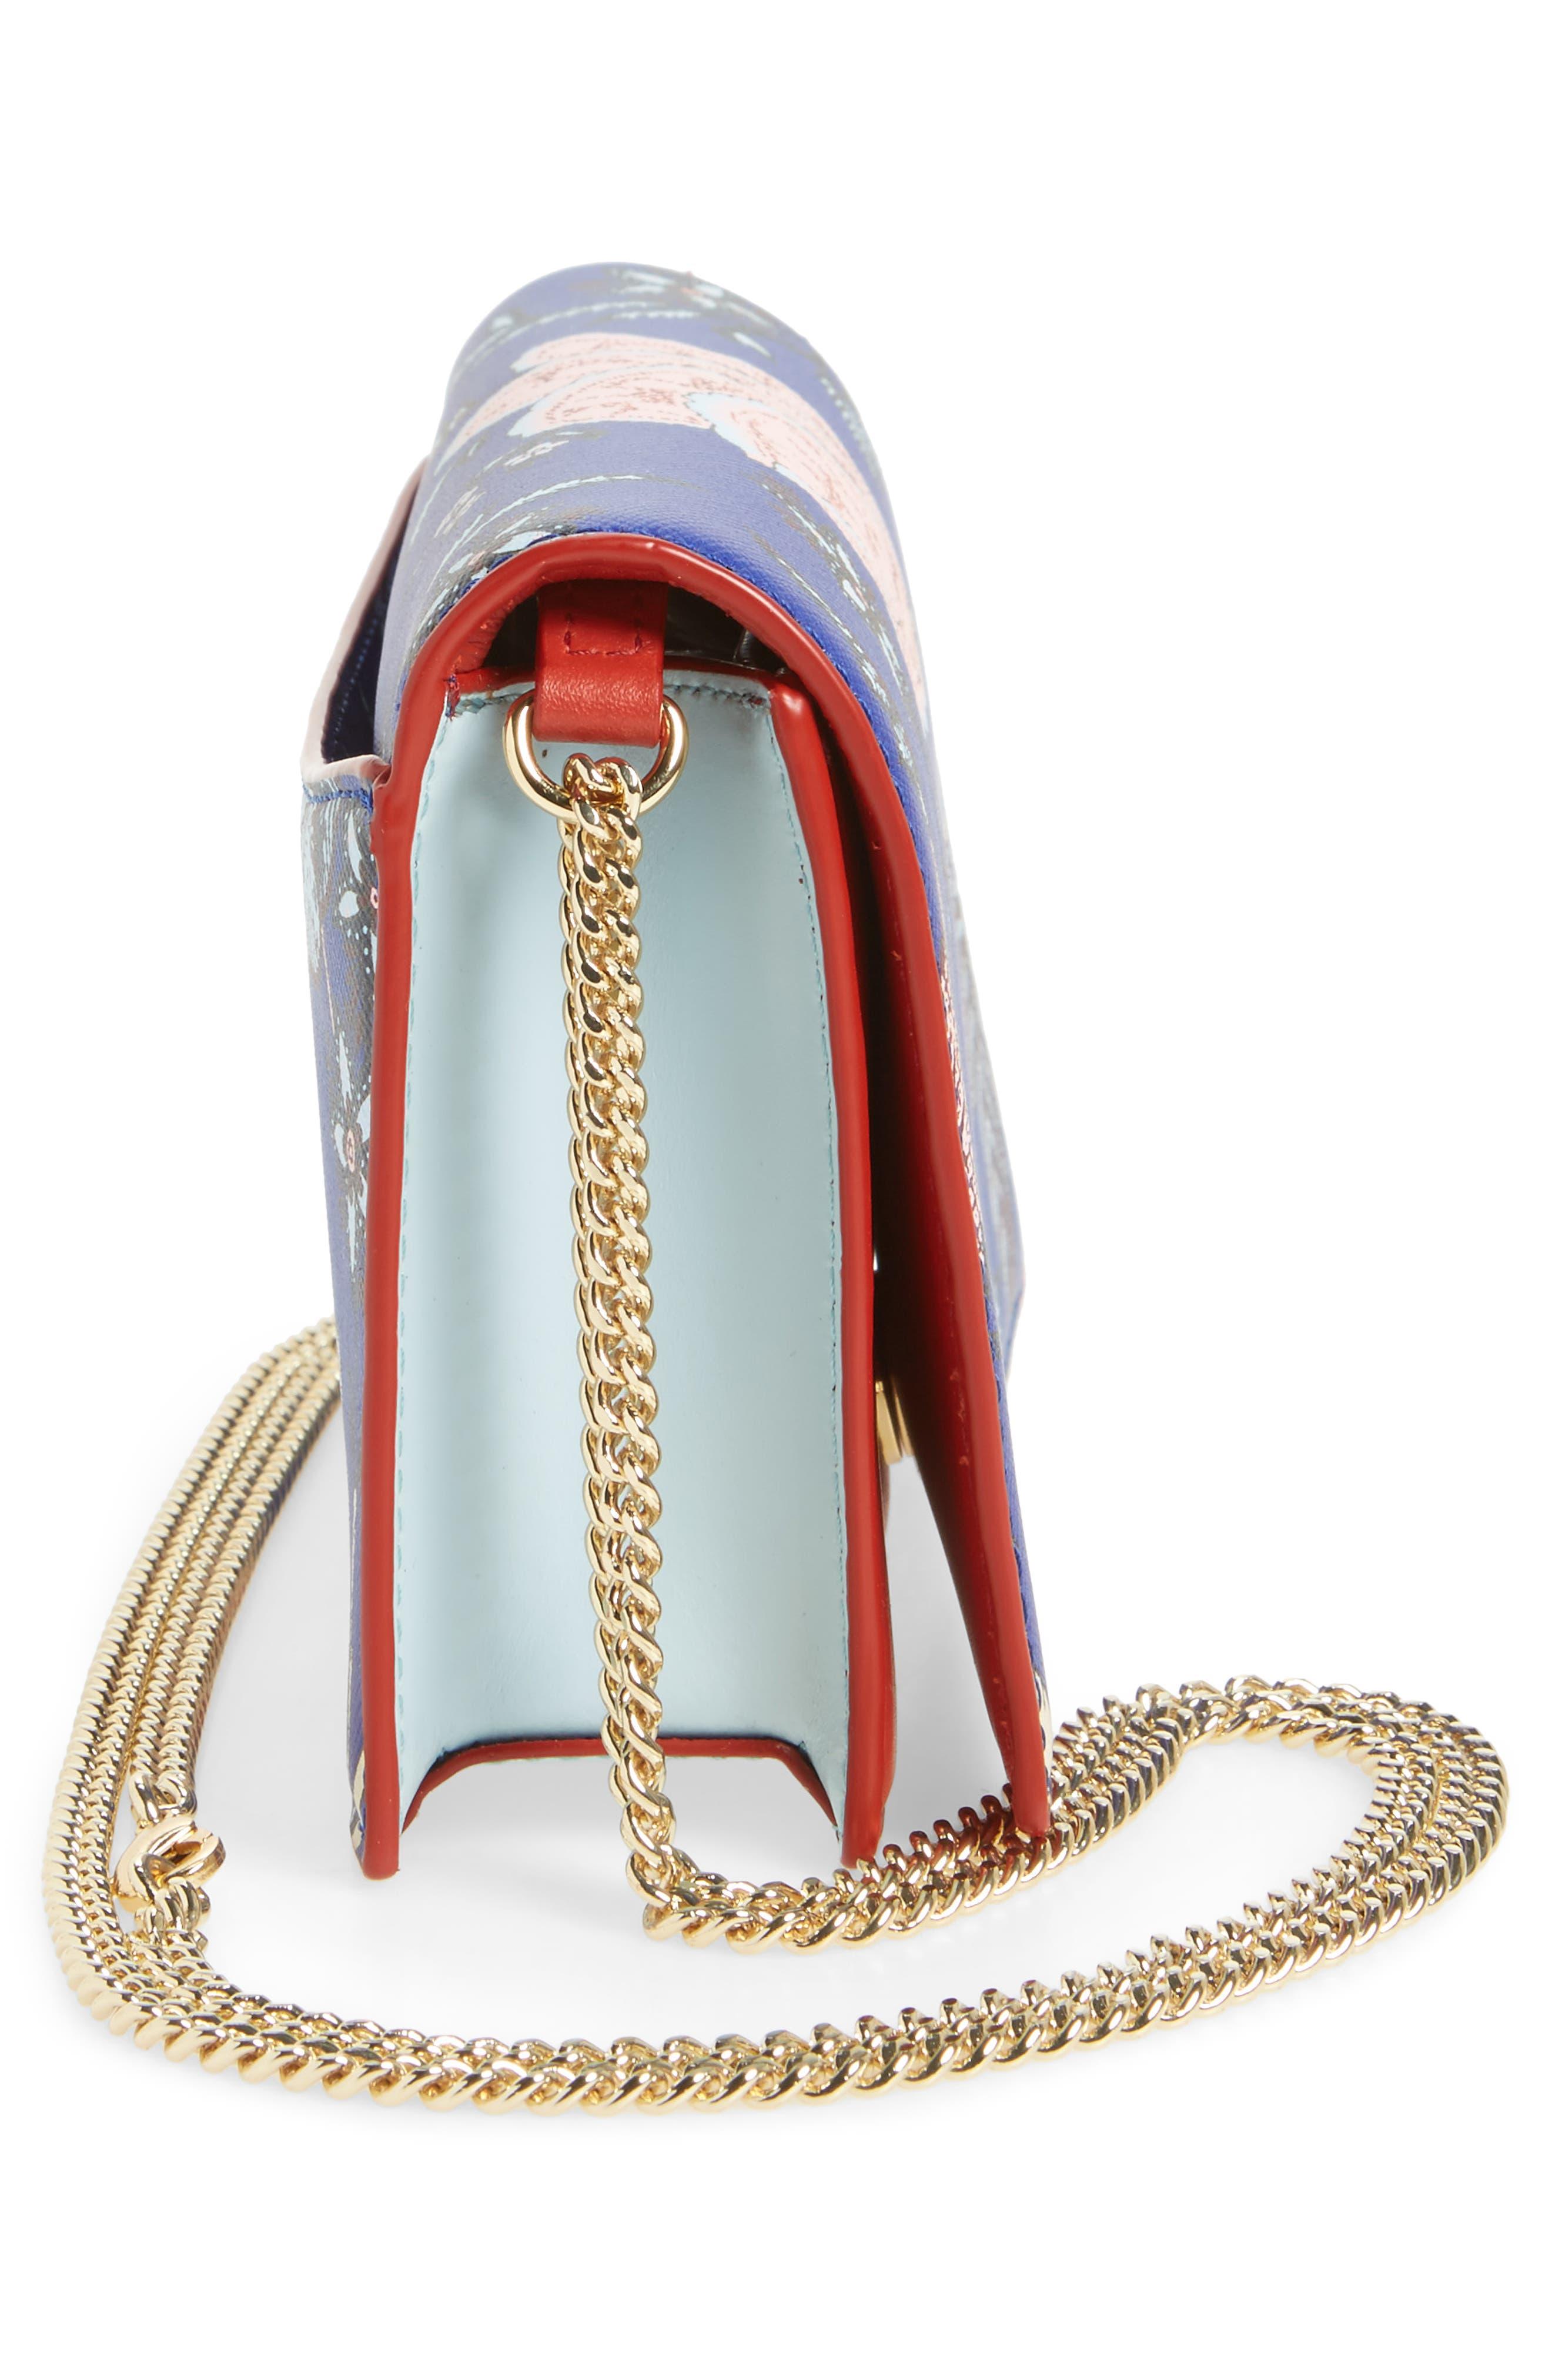 Soirée Leather Convertible Crossbody Bag,                             Alternate thumbnail 17, color,